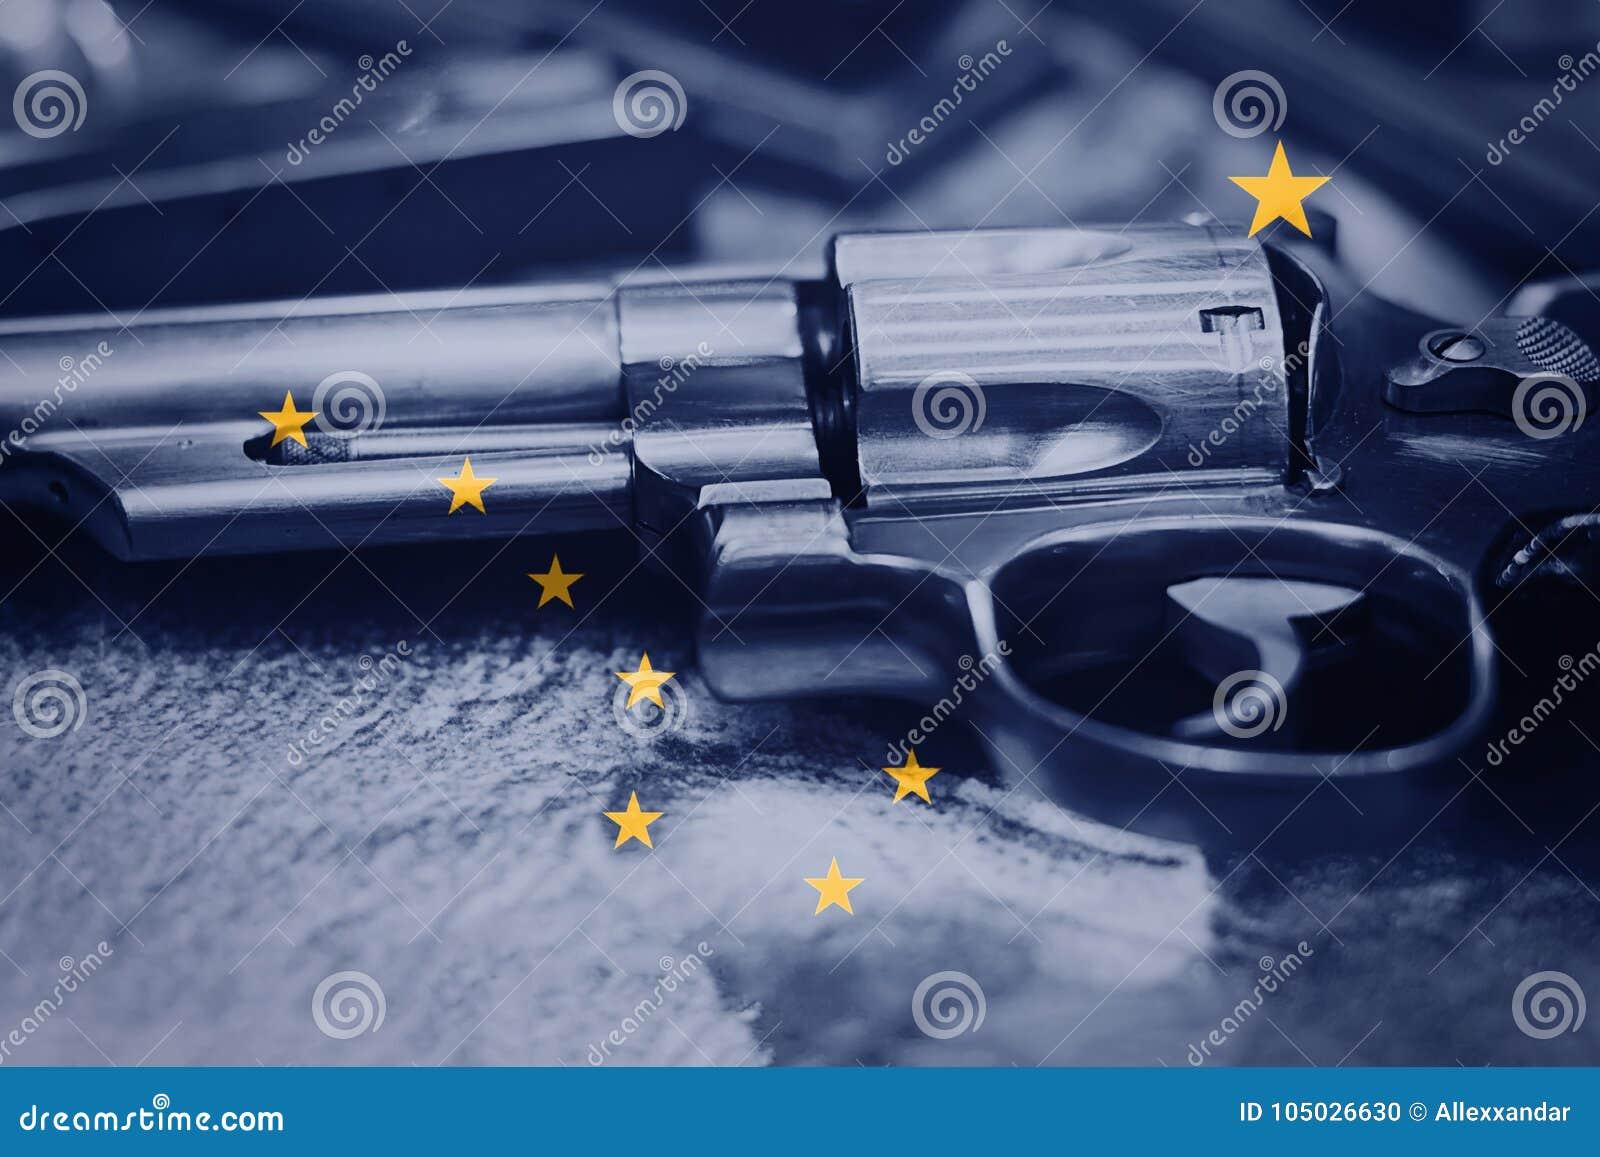 third image of Gun Laws Of Alaska with Alaska Flag U.S. State Gun Control USA. United States Gun ...